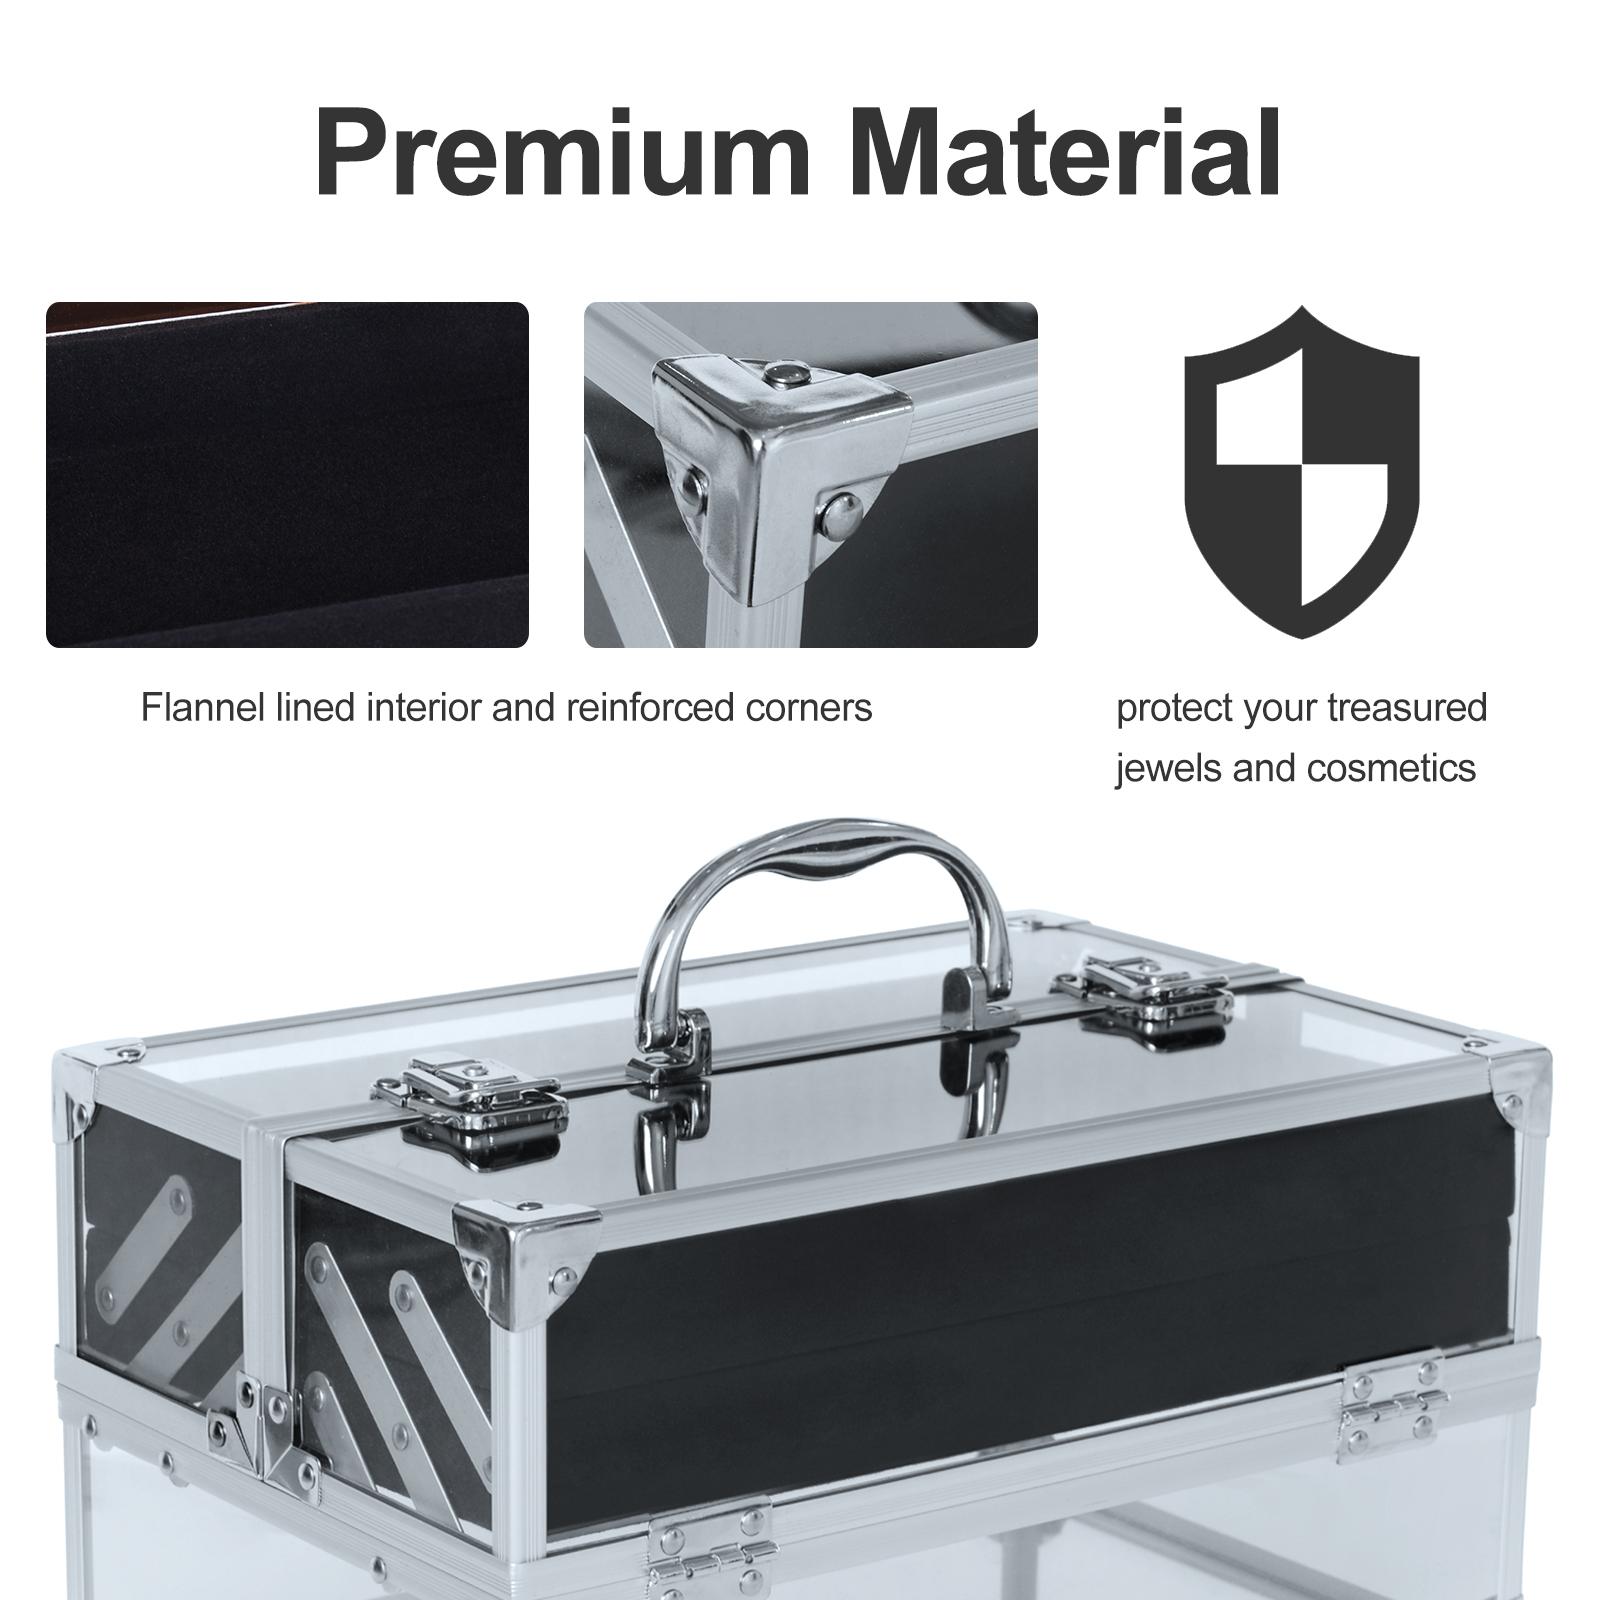 Portable-Makeup-Case-Train-Case-Lockable-Aluminum-with-4-Trays thumbnail 22